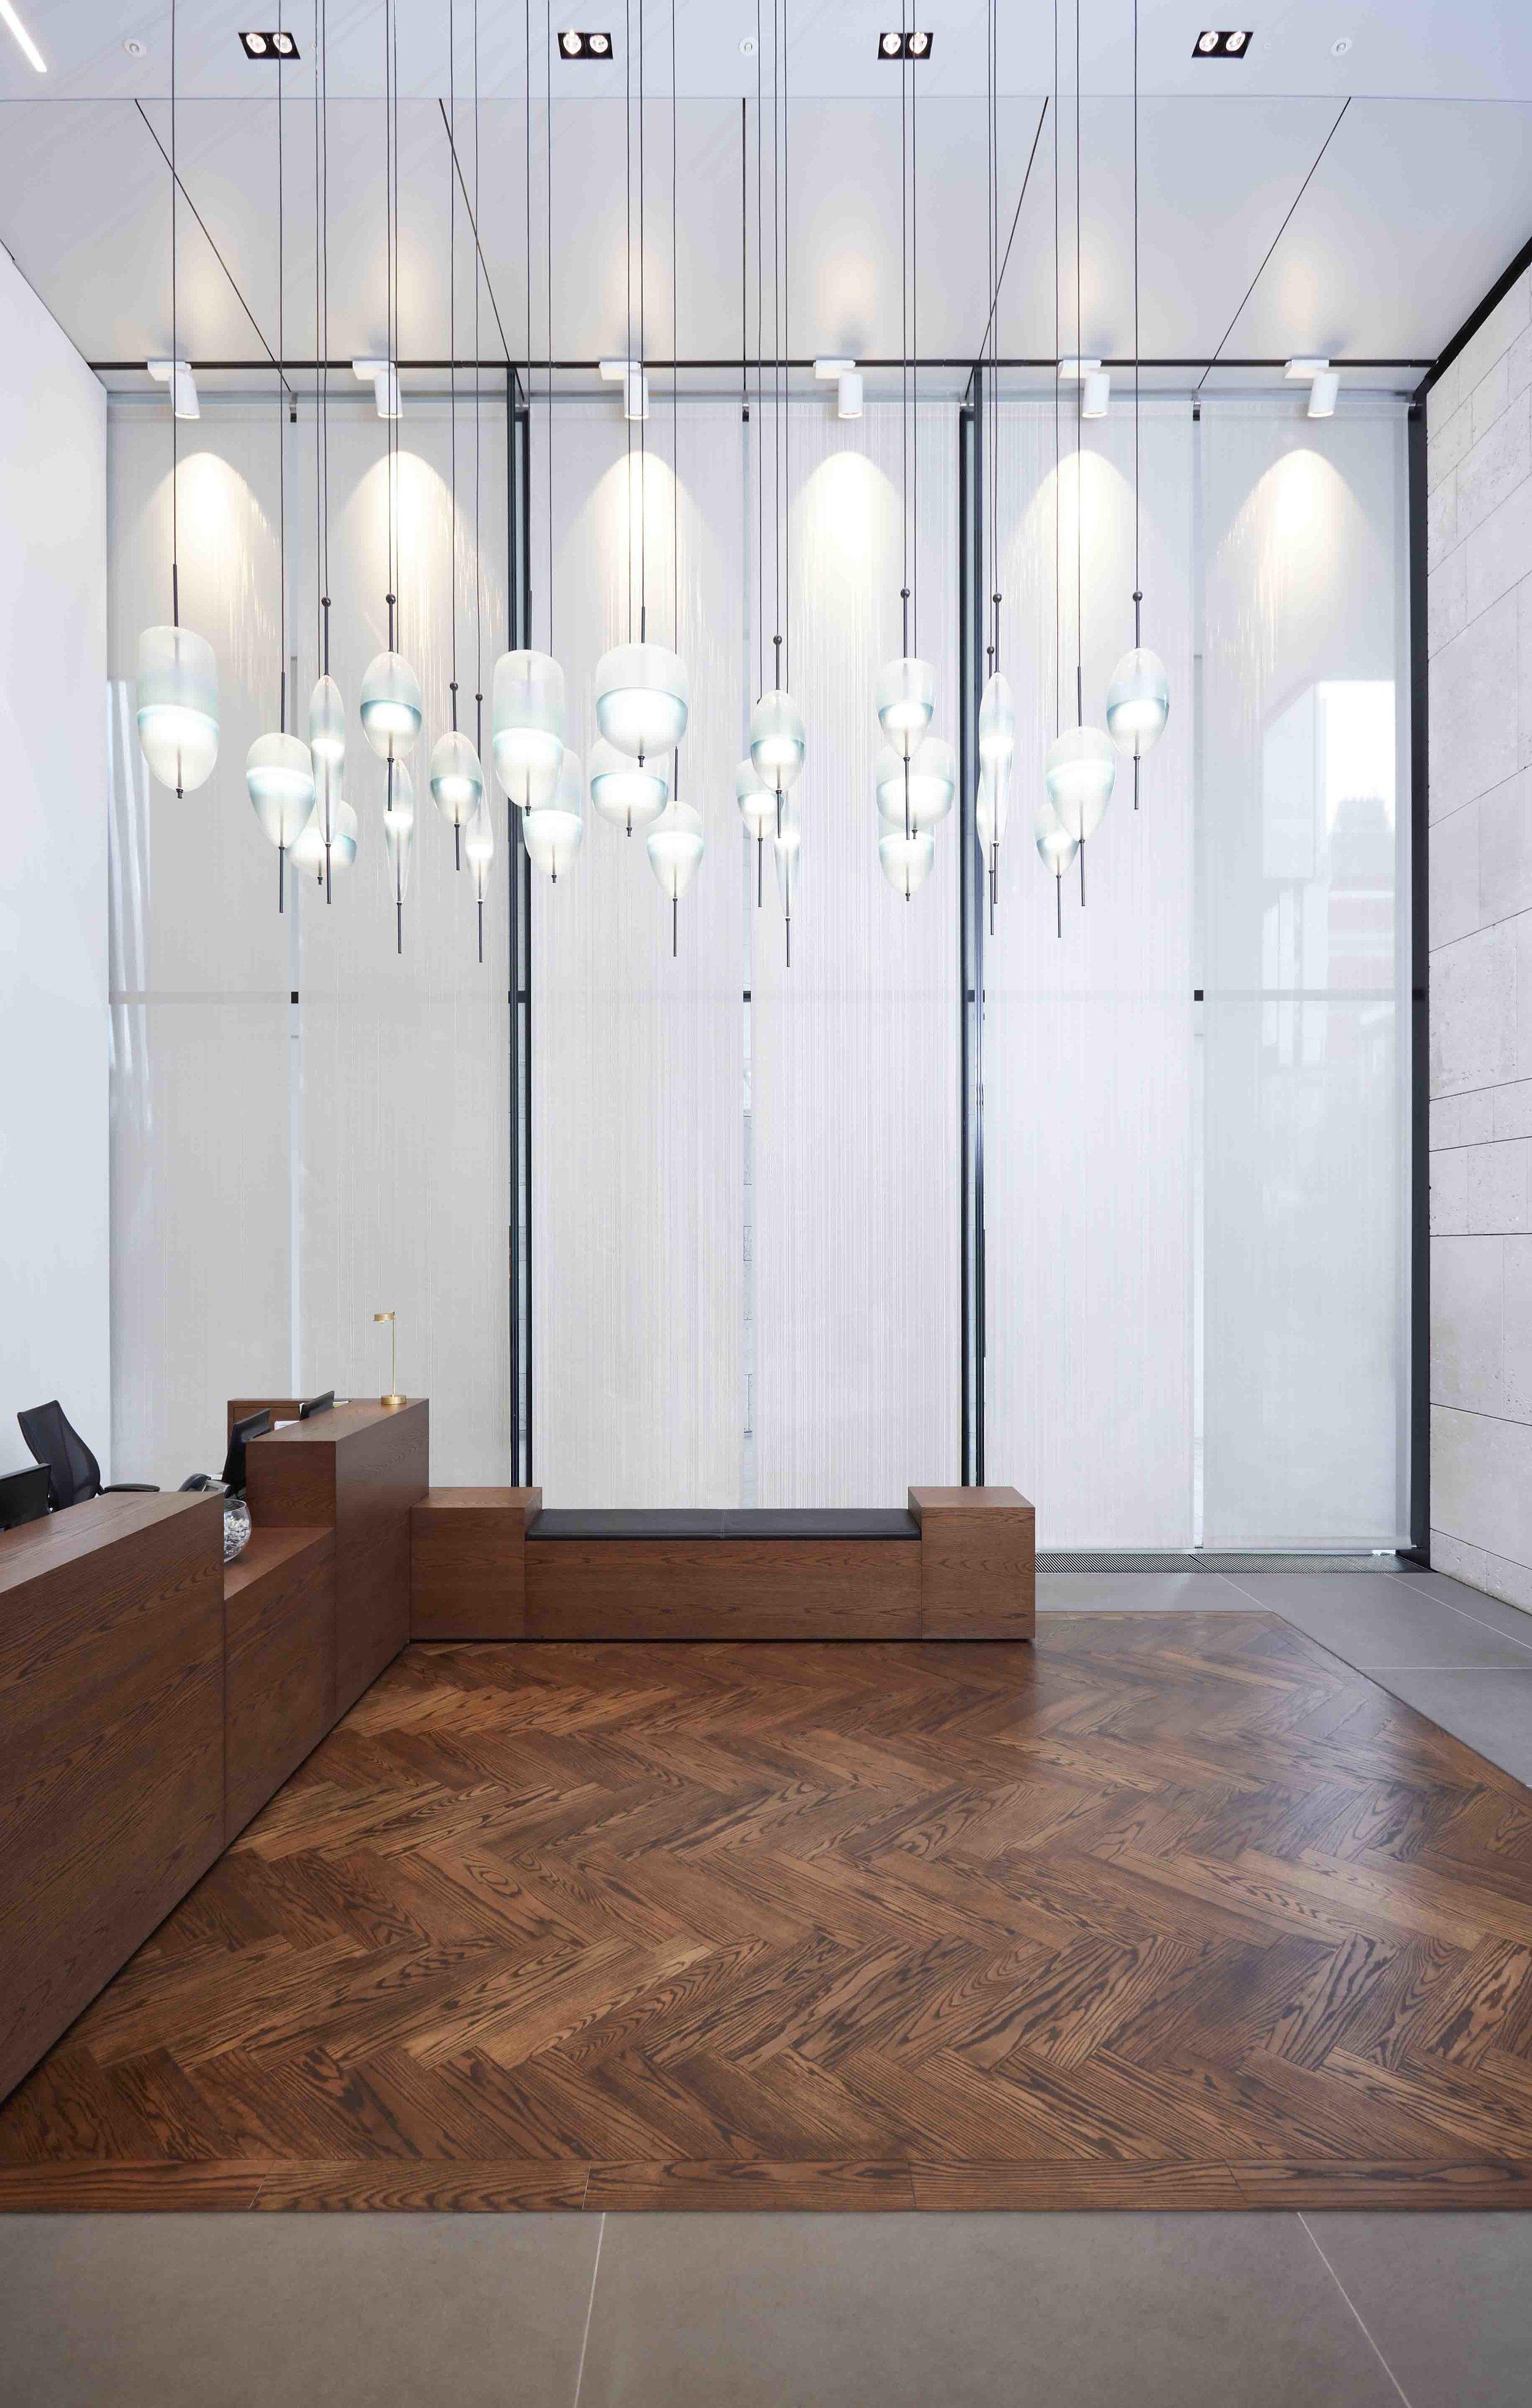 Sophie-Mallebranche-London-Fixed-Panels-Window-Treatments-Nova-Building